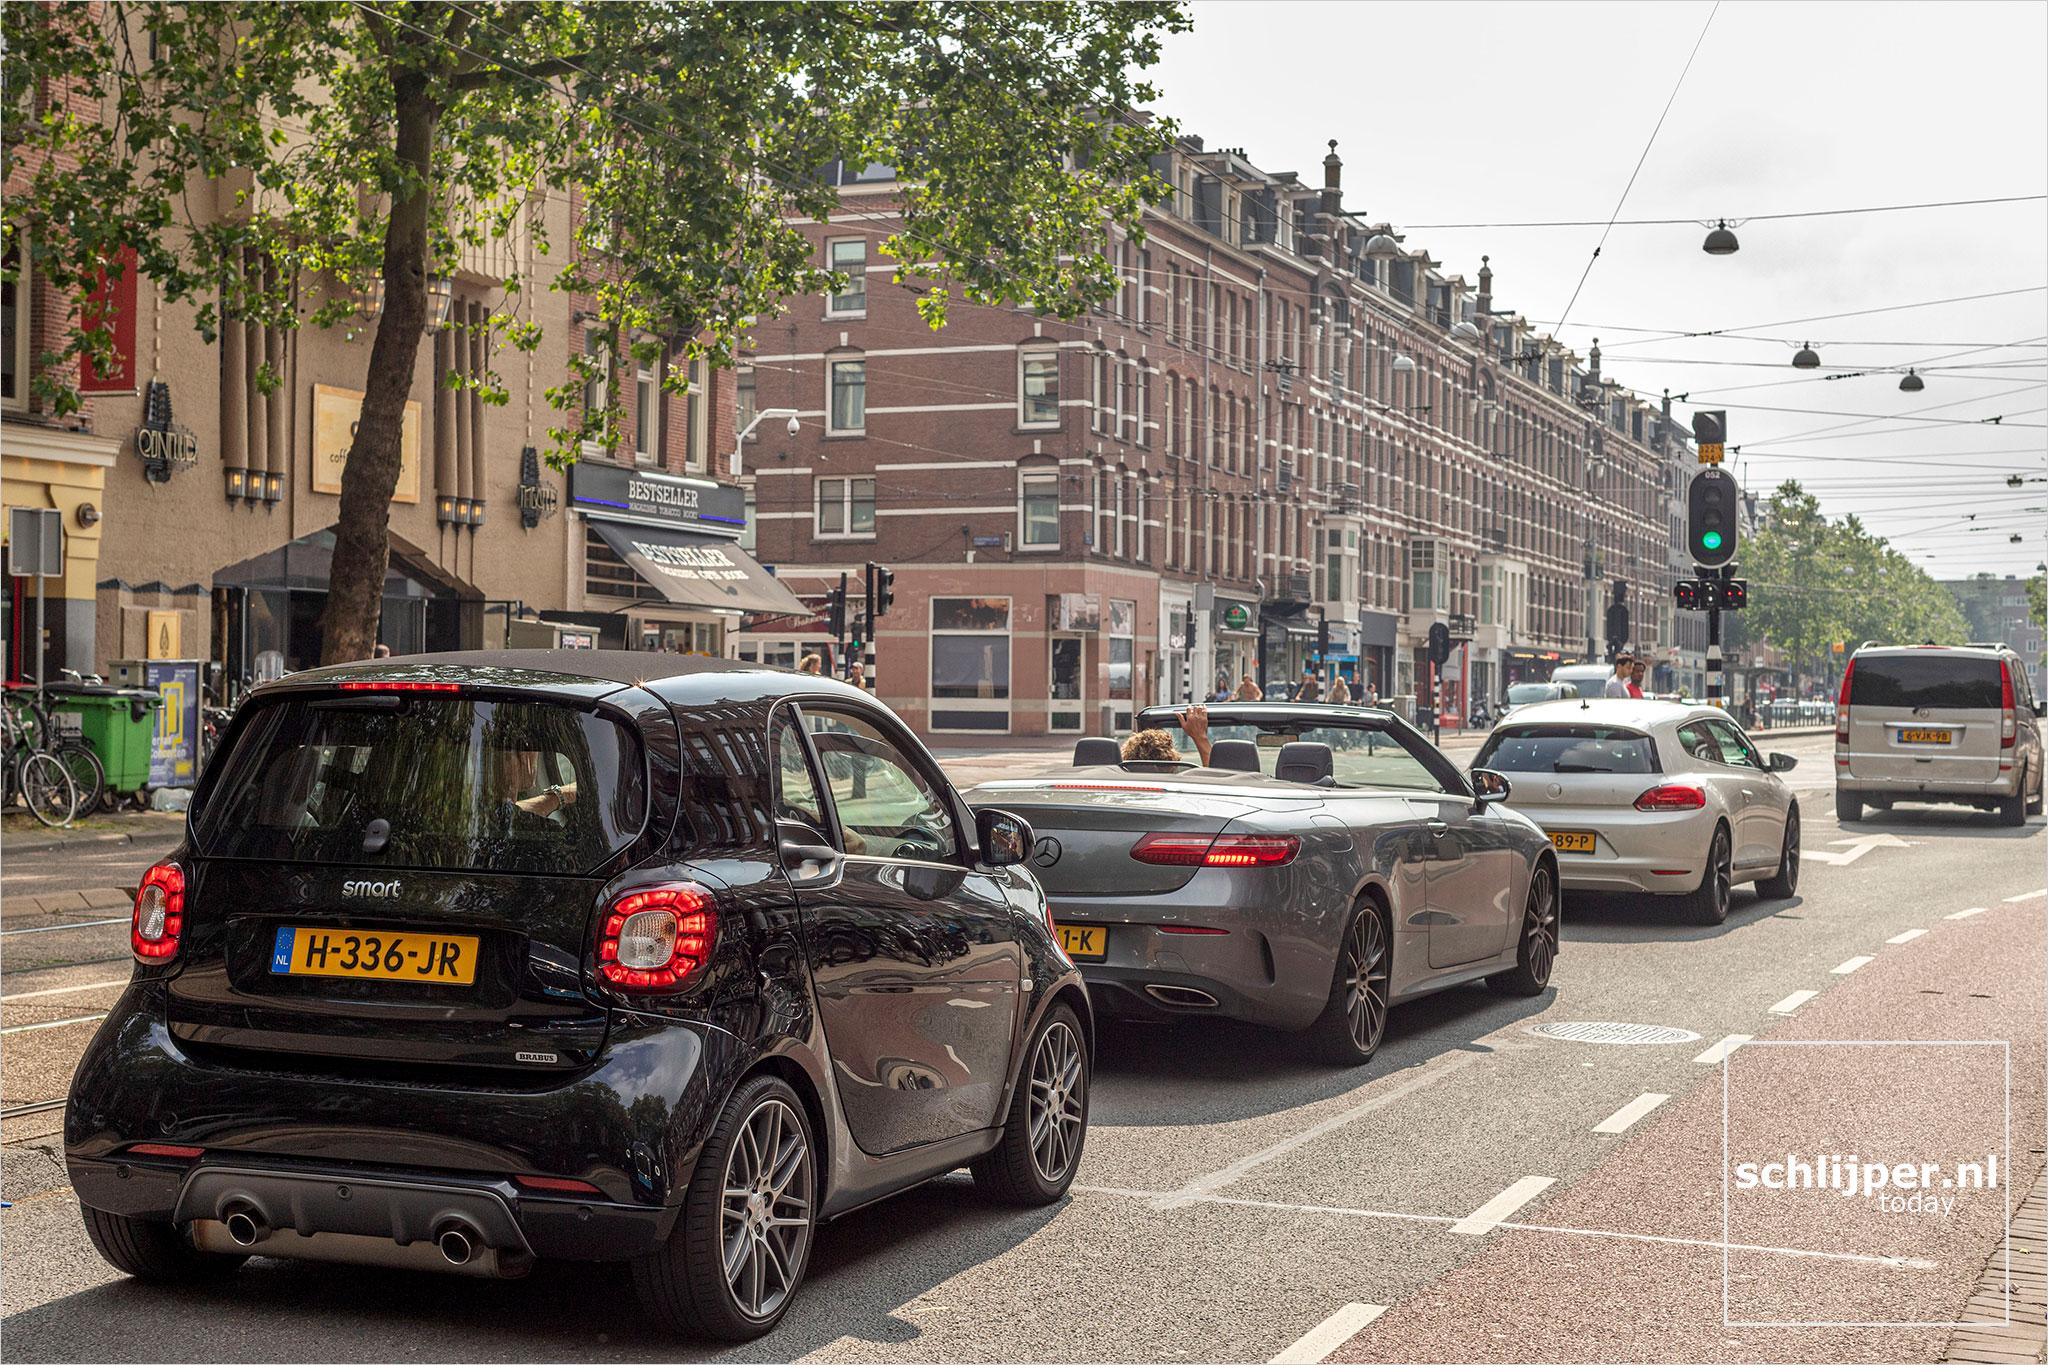 The Netherlands, Amsterdam, 11 juli 2021